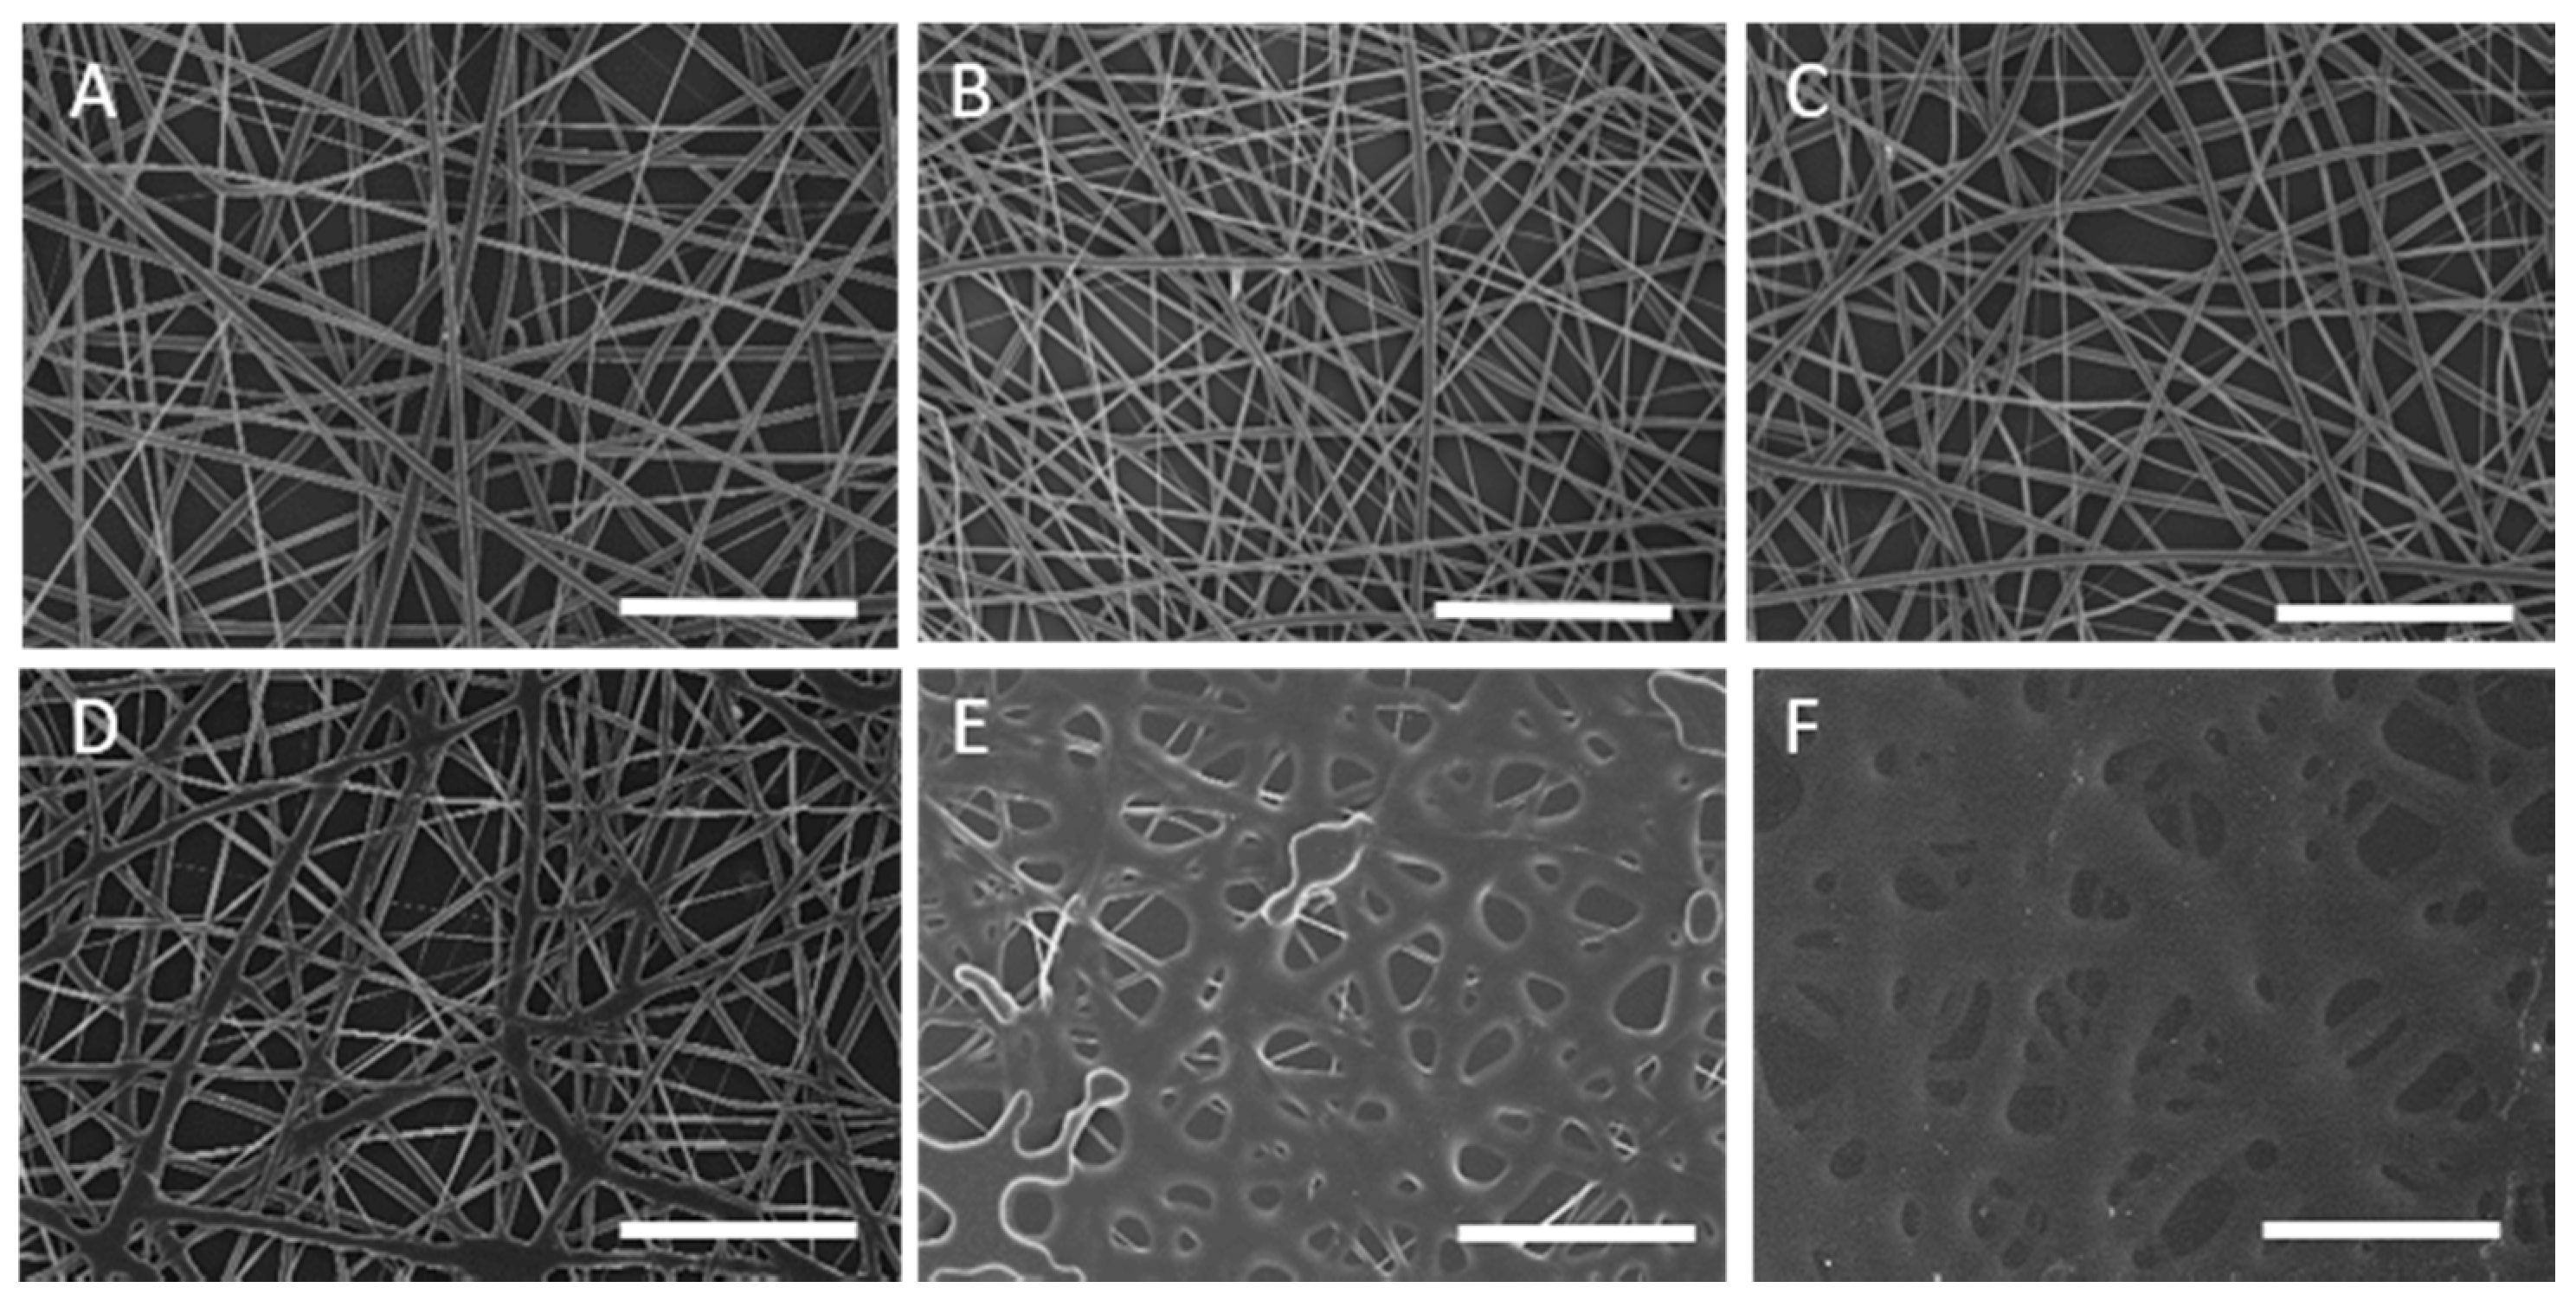 Coatings | Free Full-Text | Superhydrophobic Bio-Coating